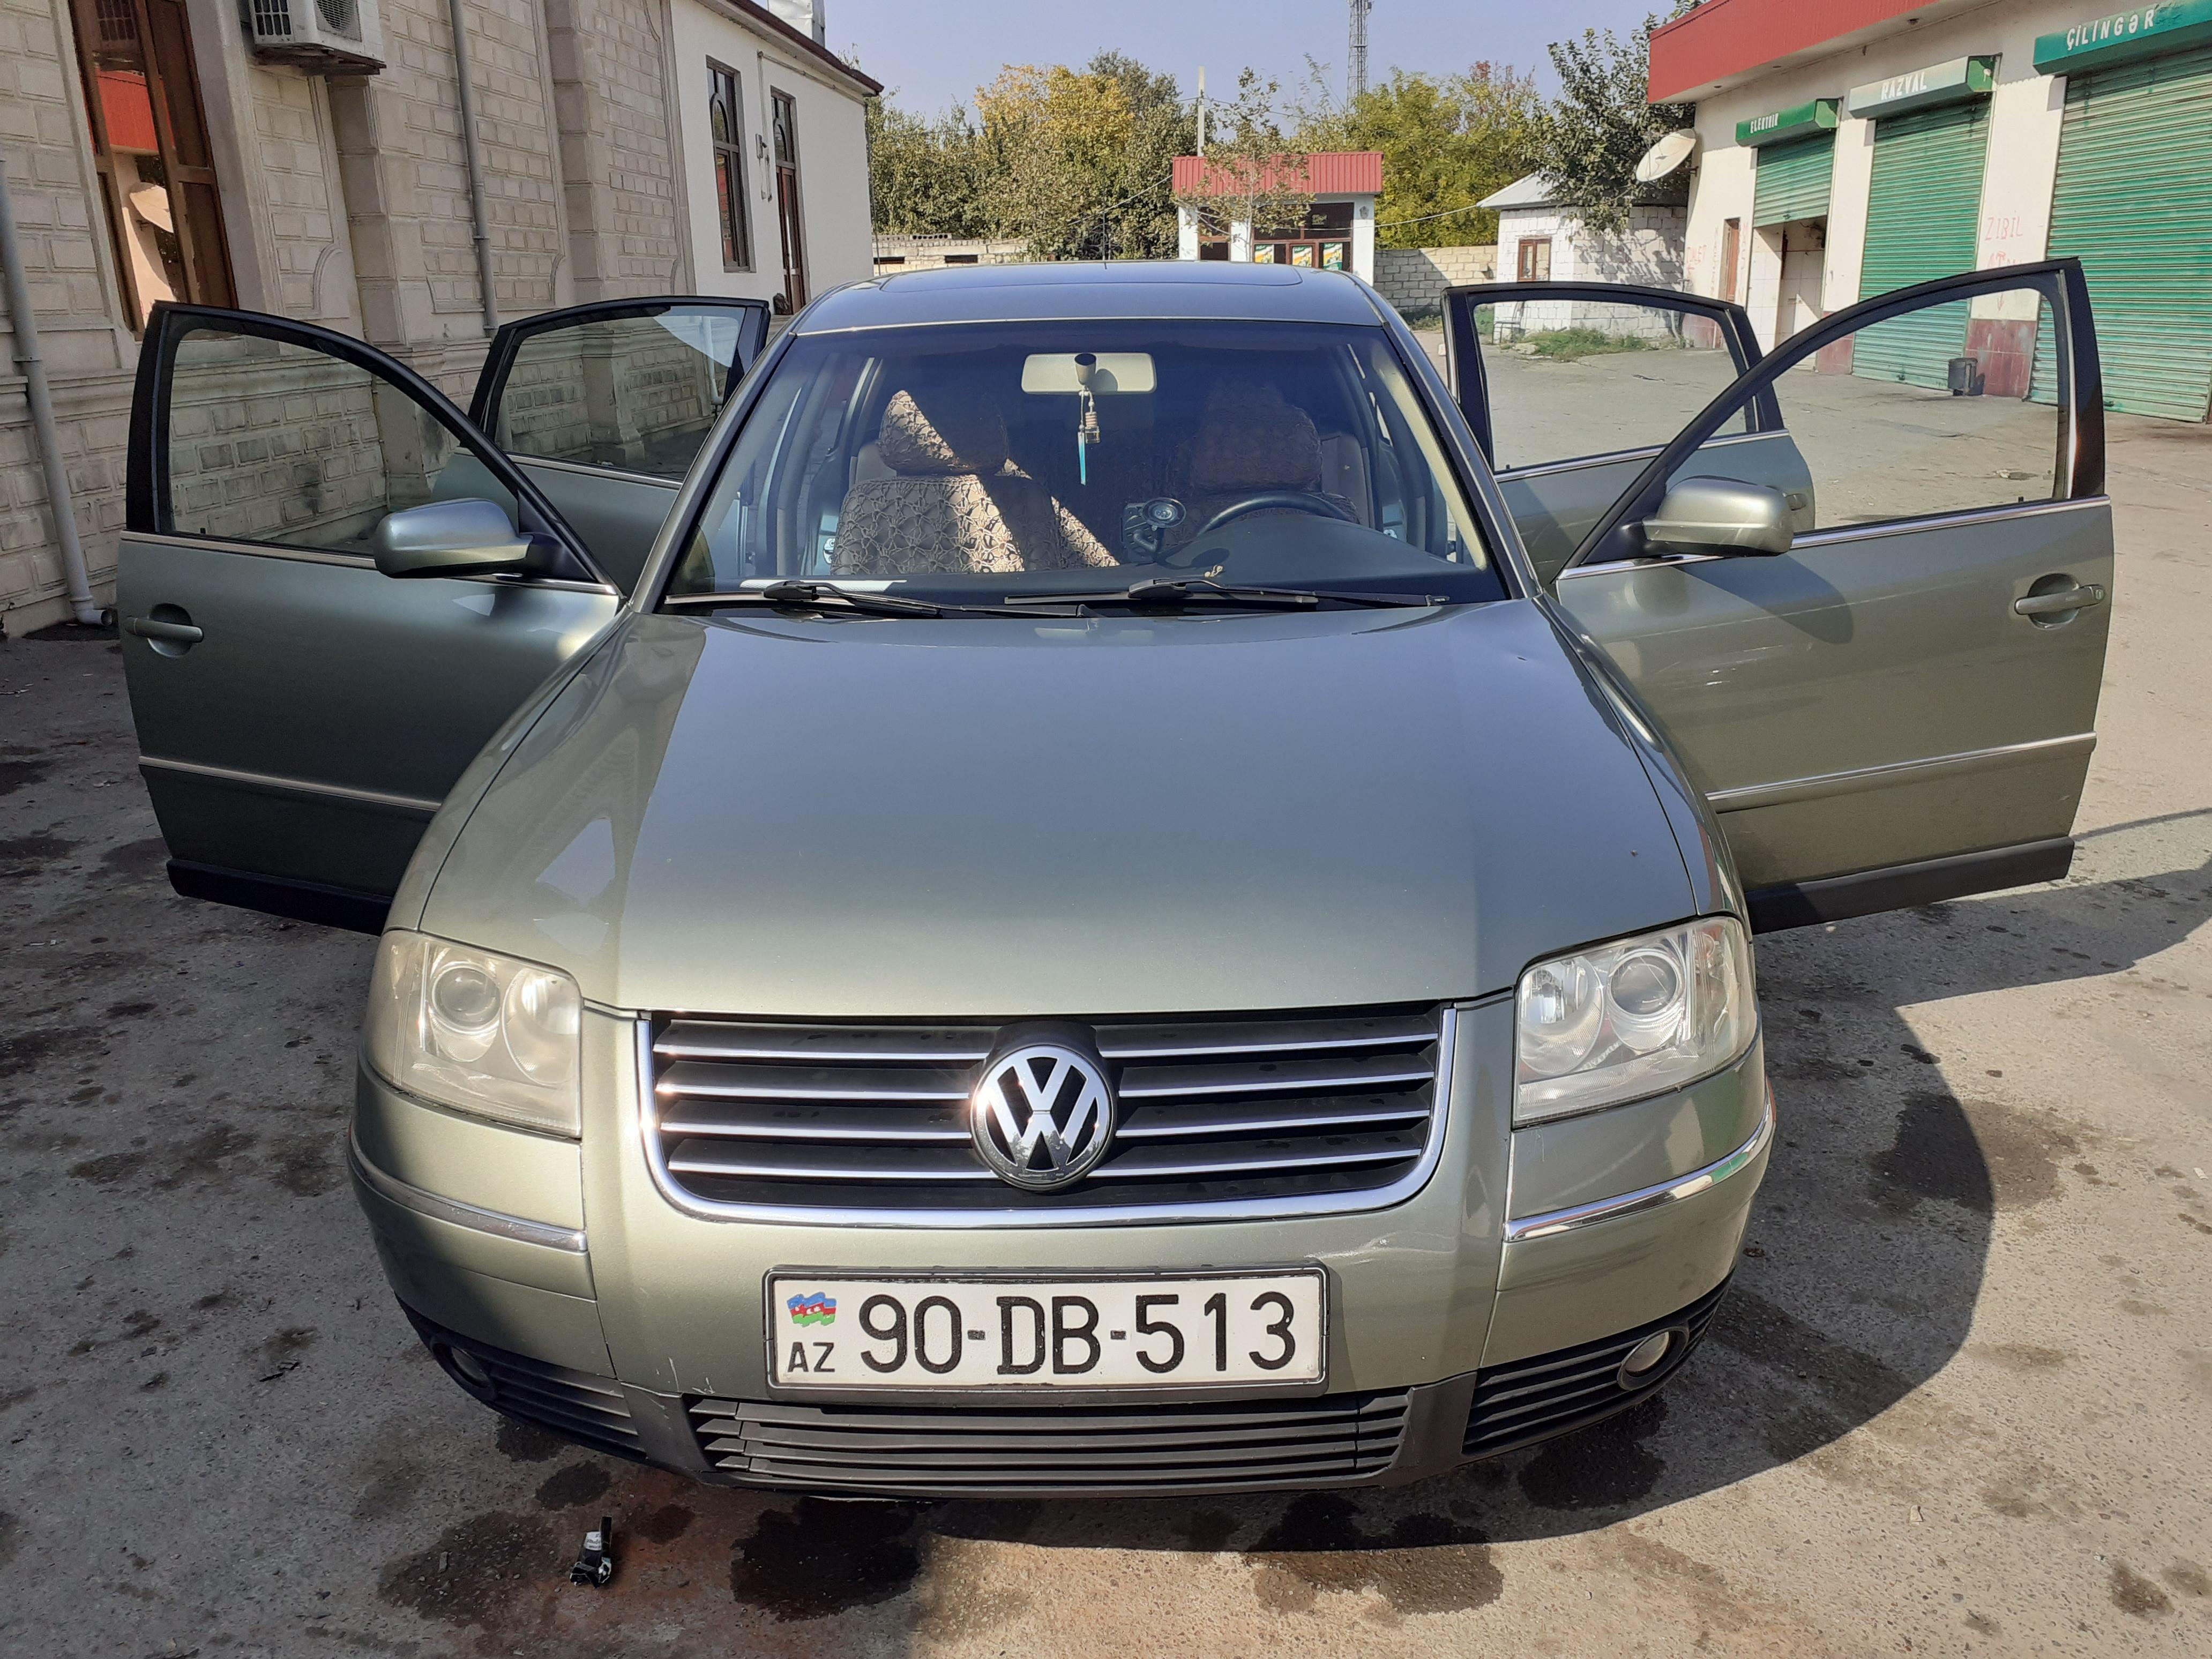 Volkswagen Passat 1.8(lt) 2002 İkinci əl  $4500